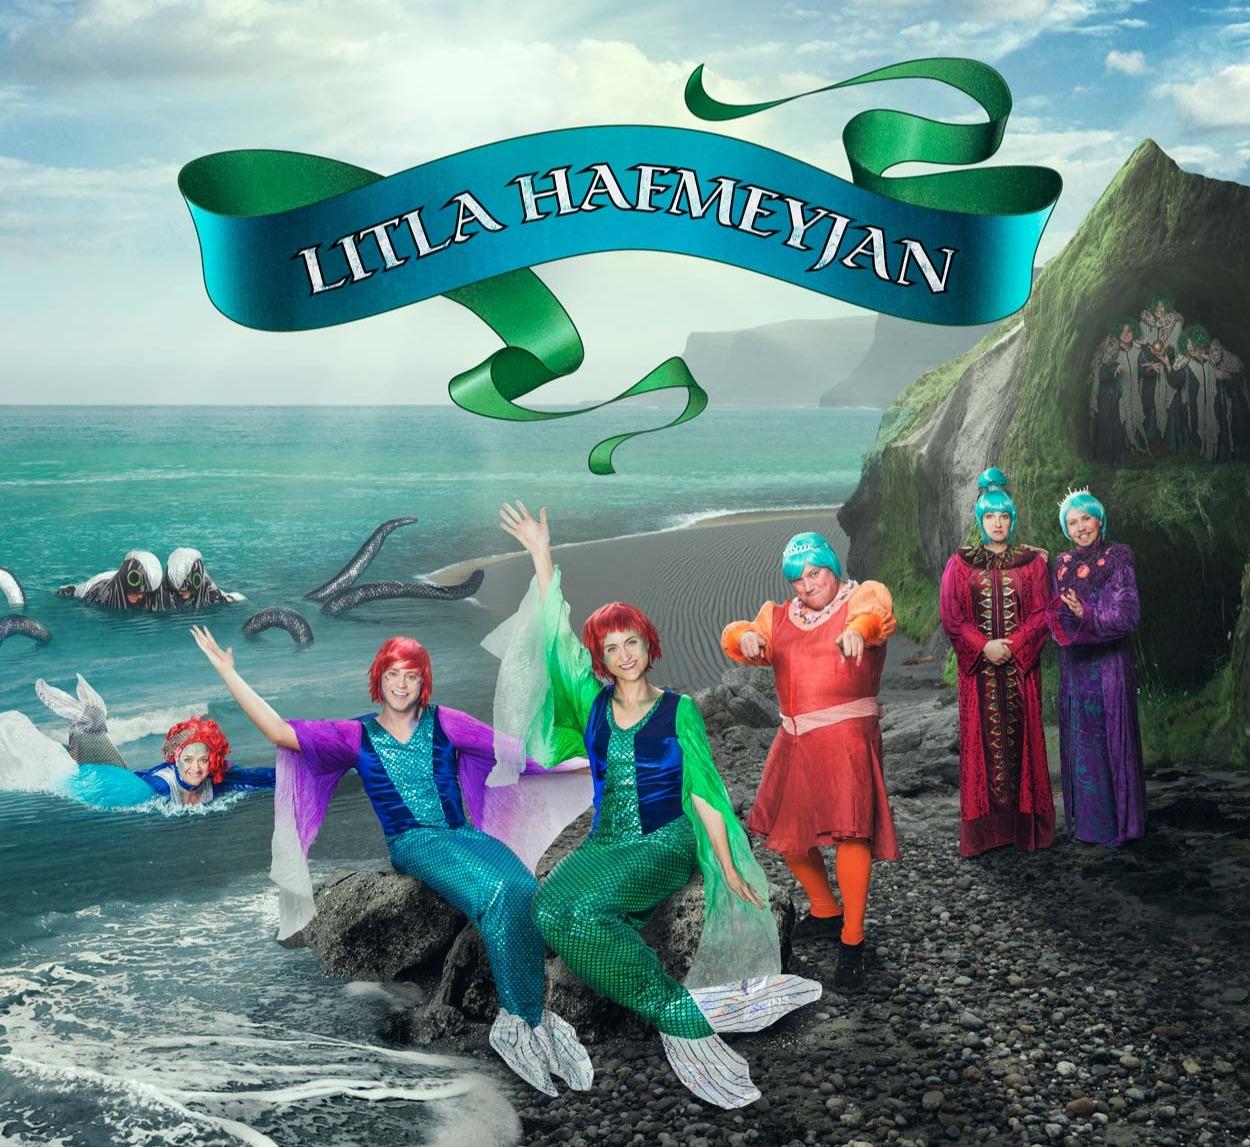 Lotta-litla-hafmeyjan-banner_edited